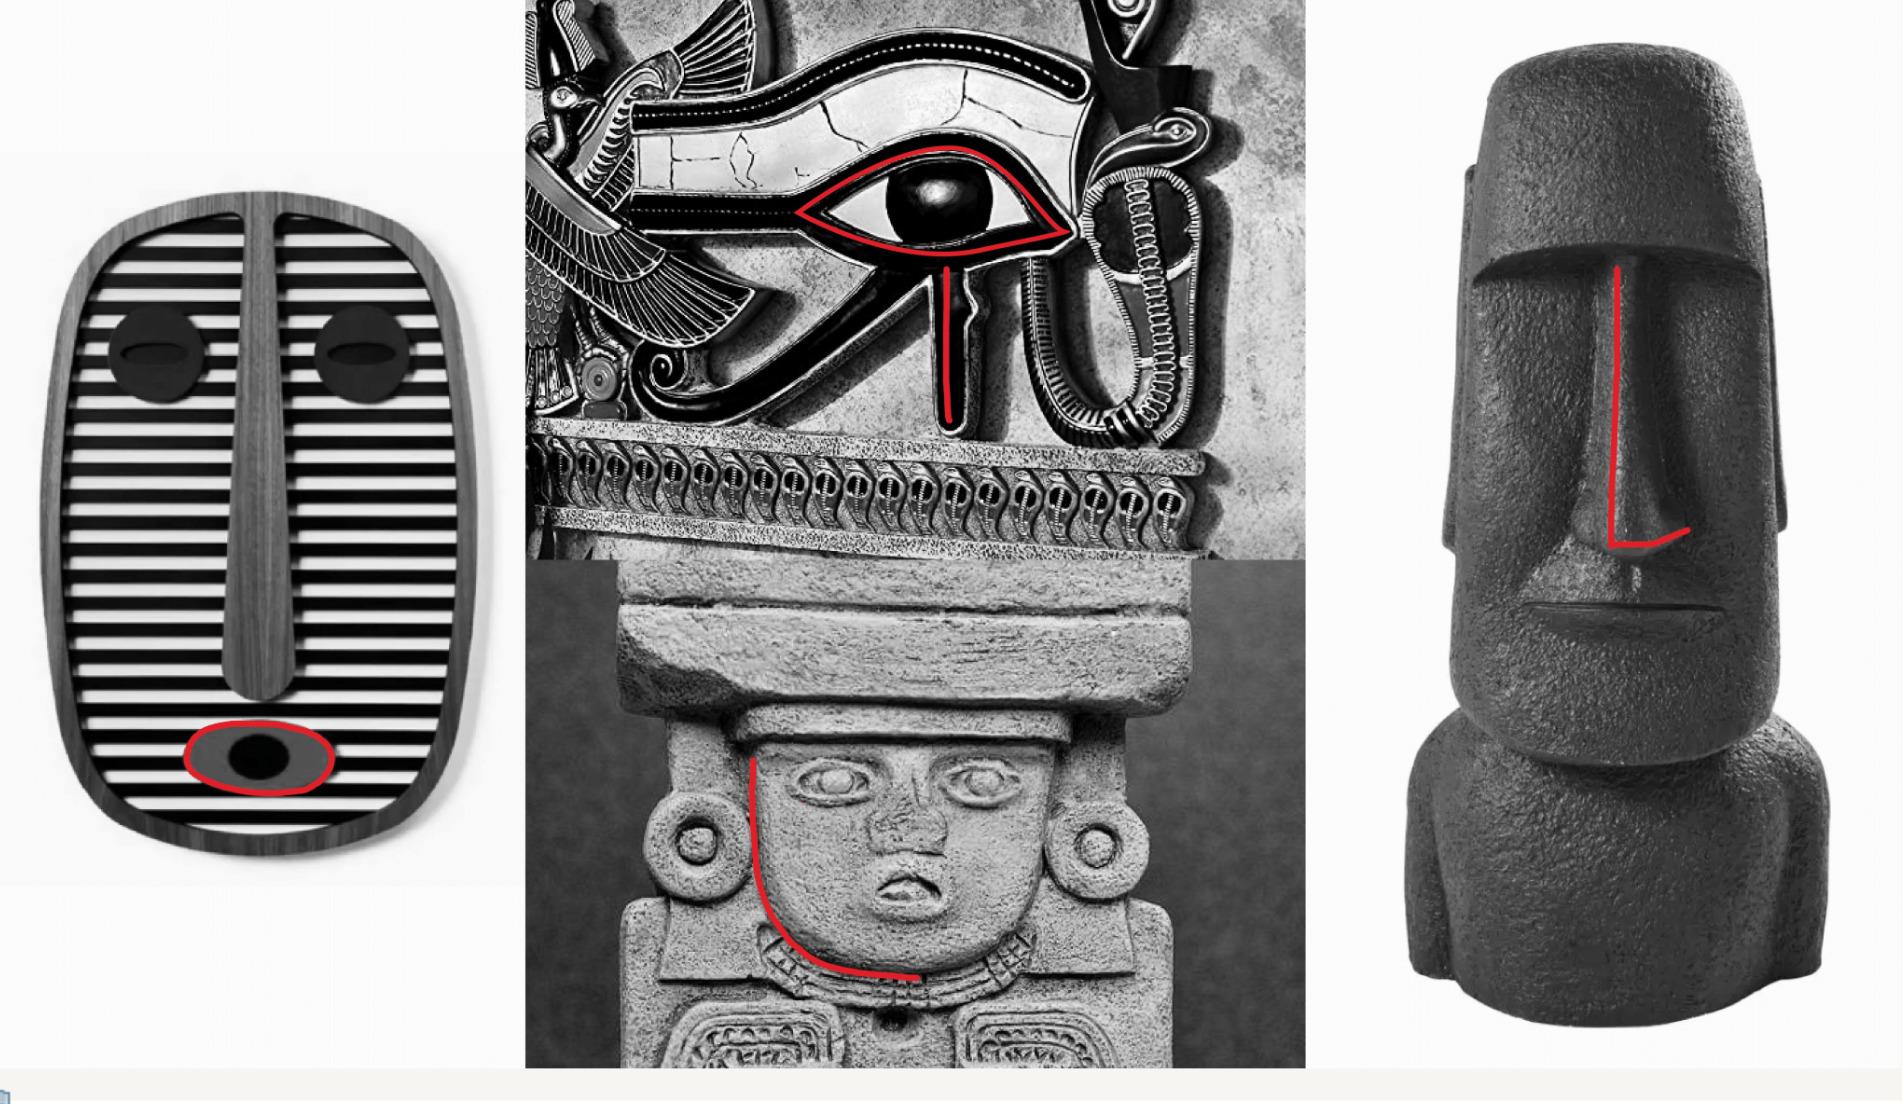 rovereto_ram-film-festival_horus aztechi rapanui_nel-logo_foto-fmcr